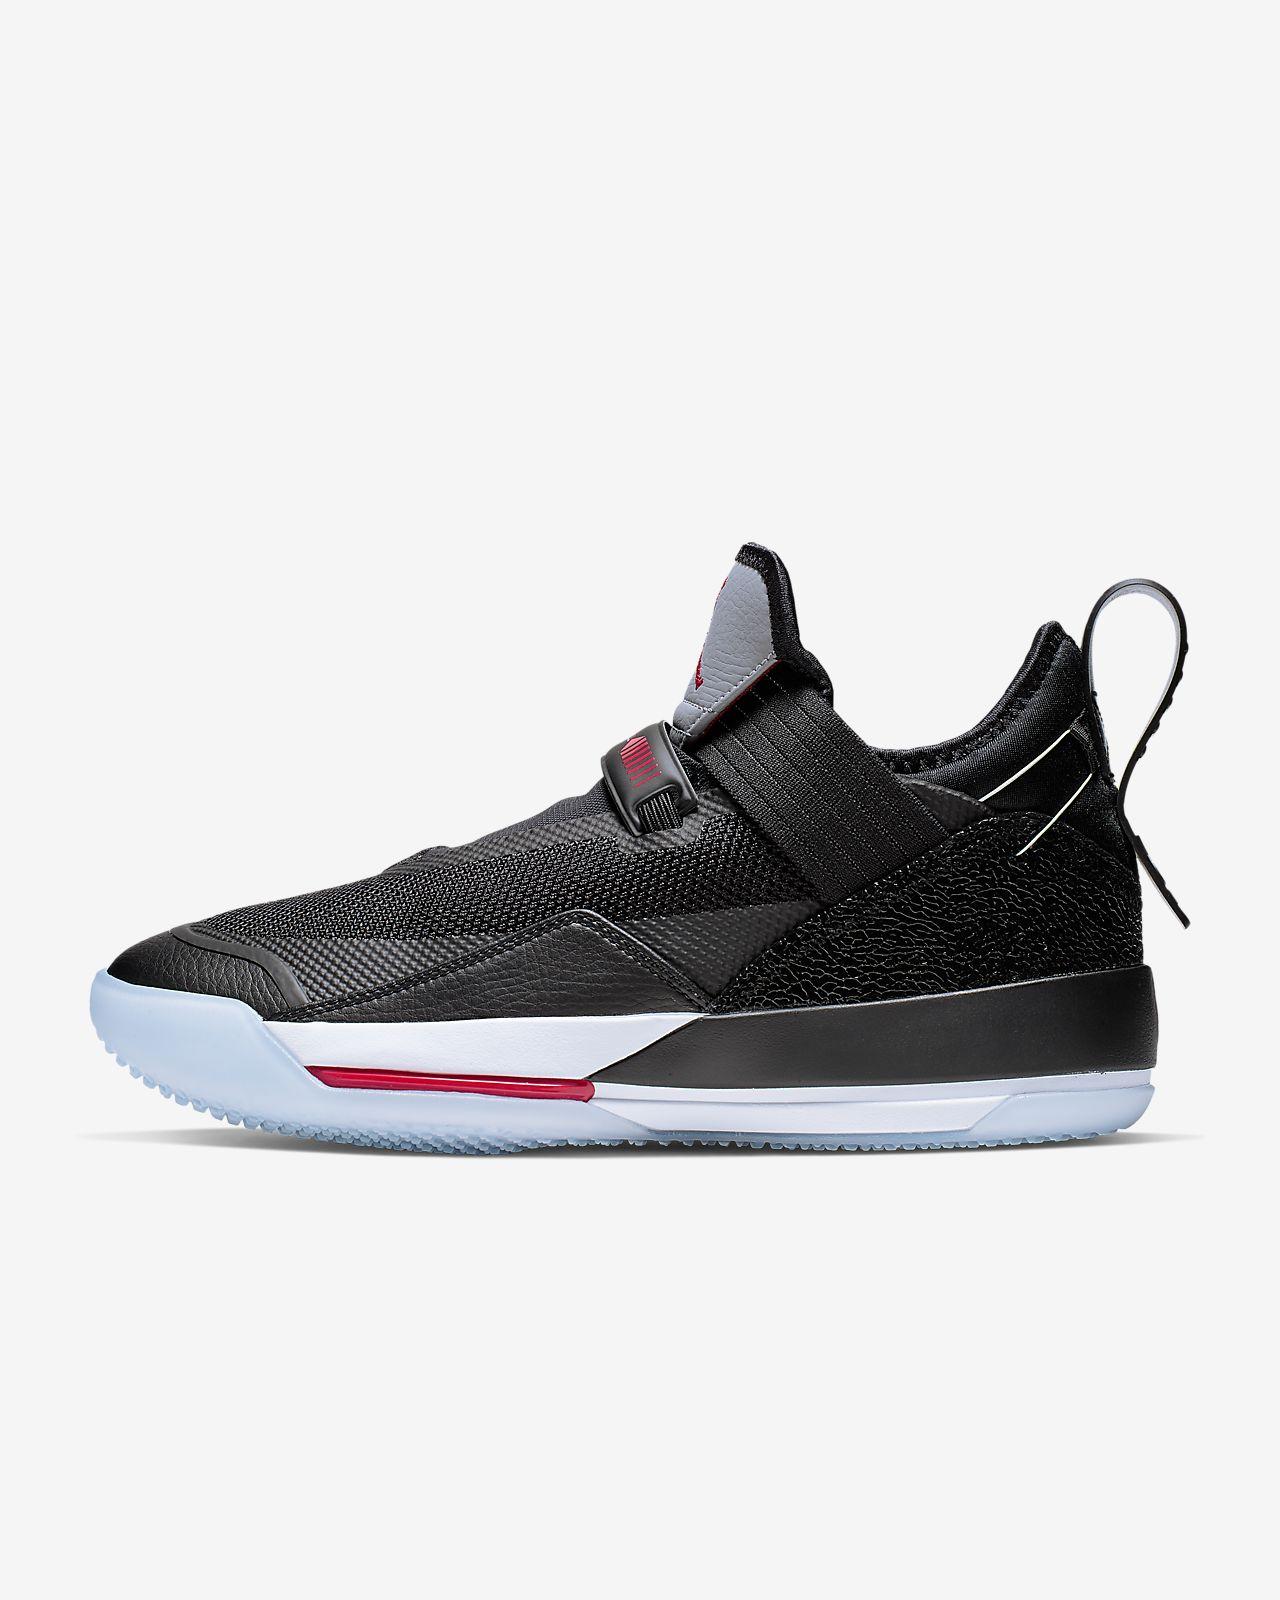 4357954e3ae3 Air Jordan XXXIII SE Men s Basketball Shoe. Nike.com PT